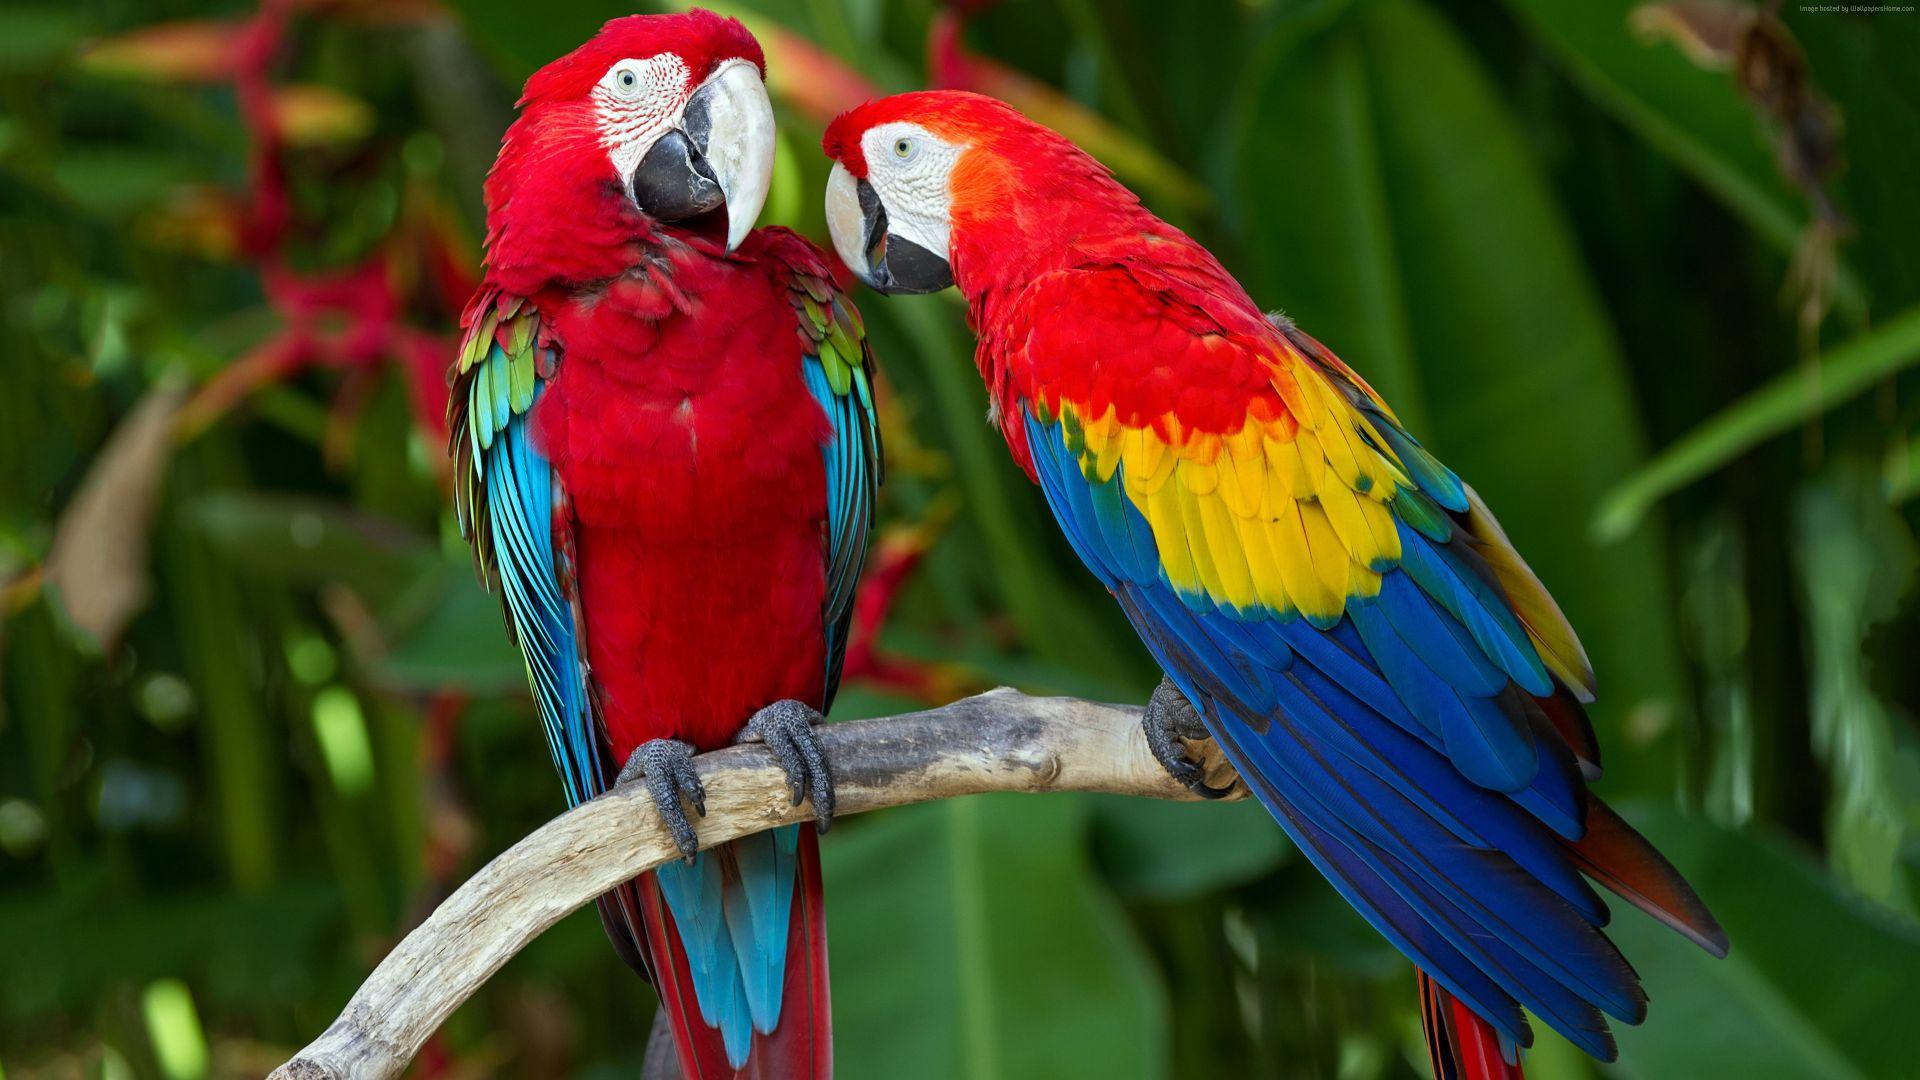 Wallpaper Macaw Parrot birds, sitting, branch